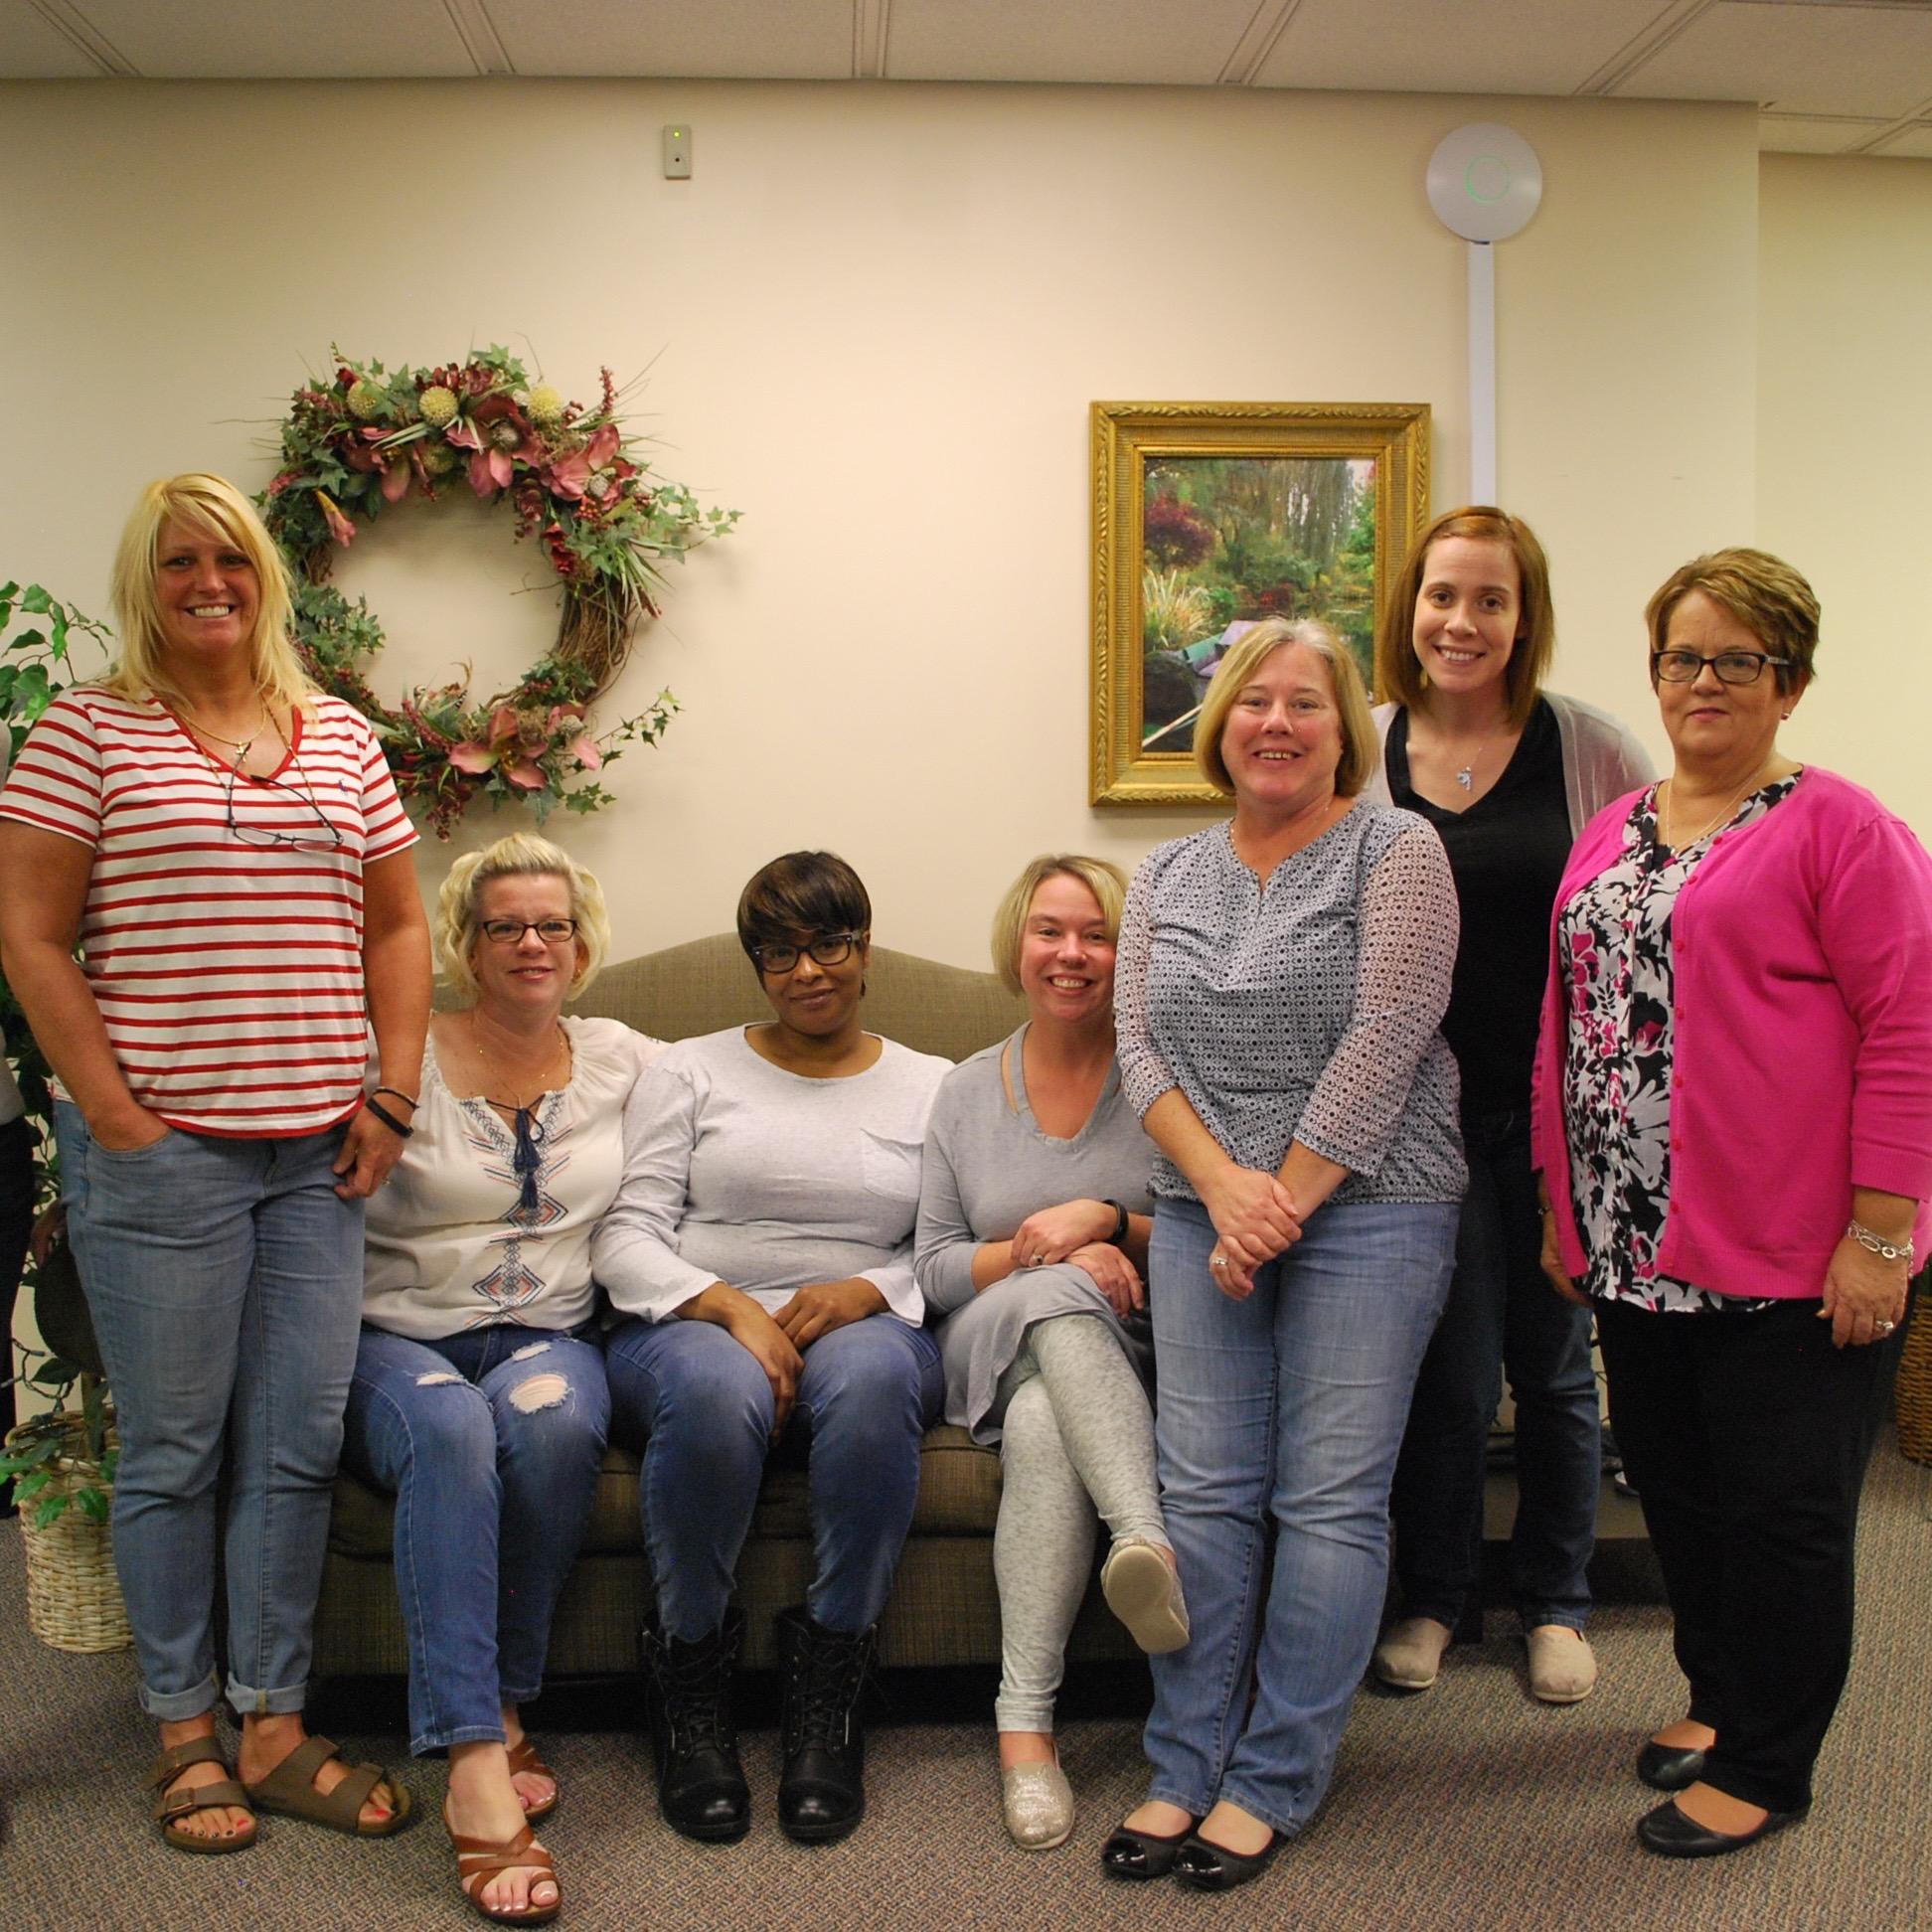 Staff at Rankin Christian Center